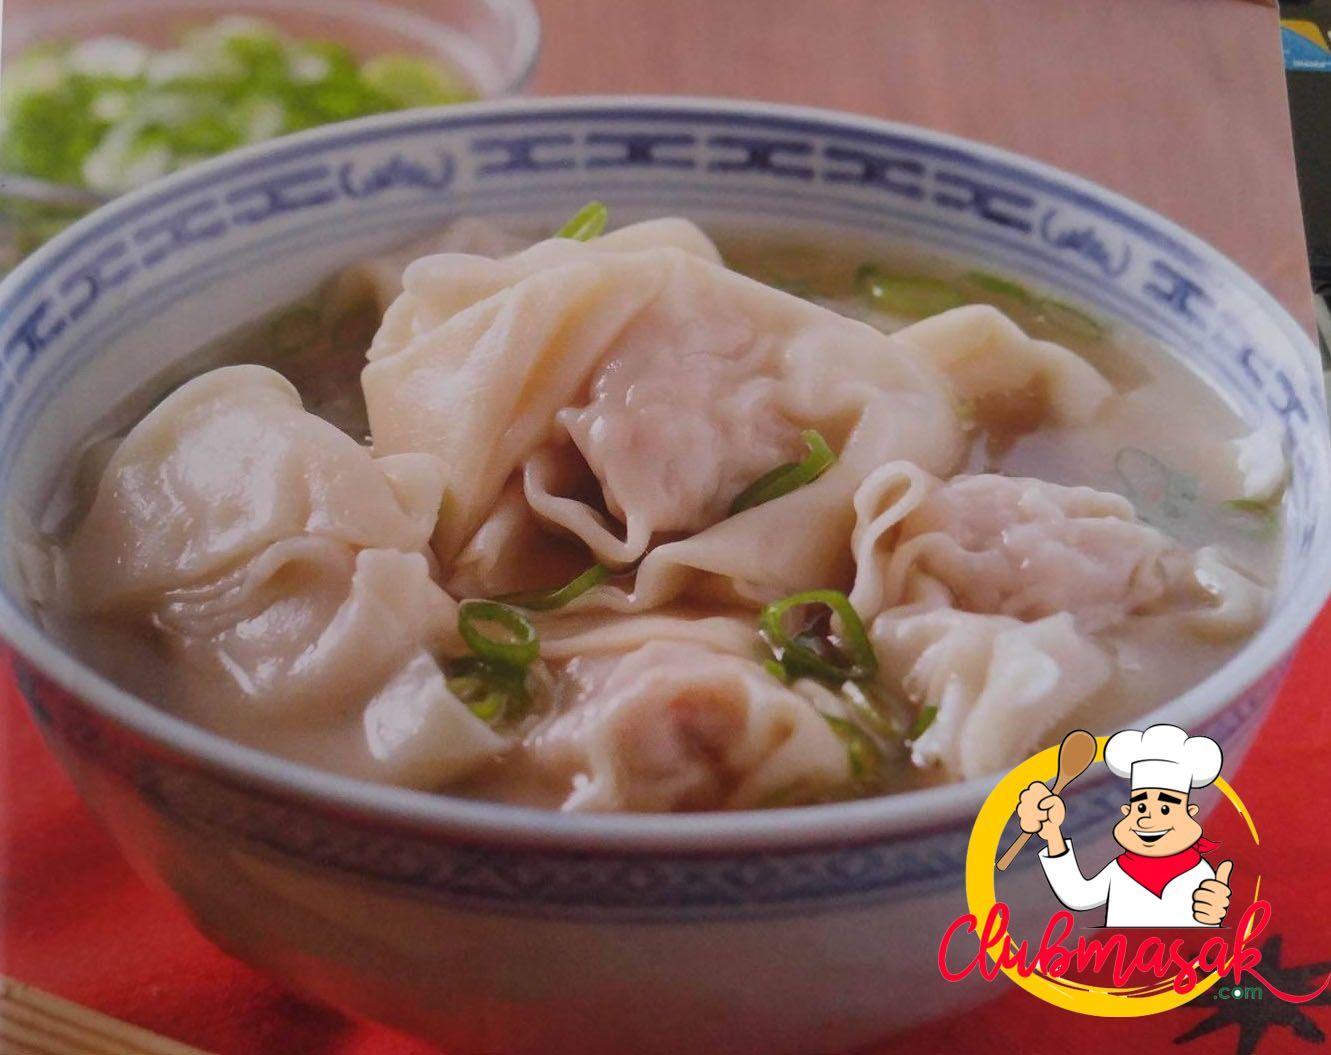 Masakan China Kuno Resep Wonton Soup Club Masak Masakan China Kuno Pinterest Menu